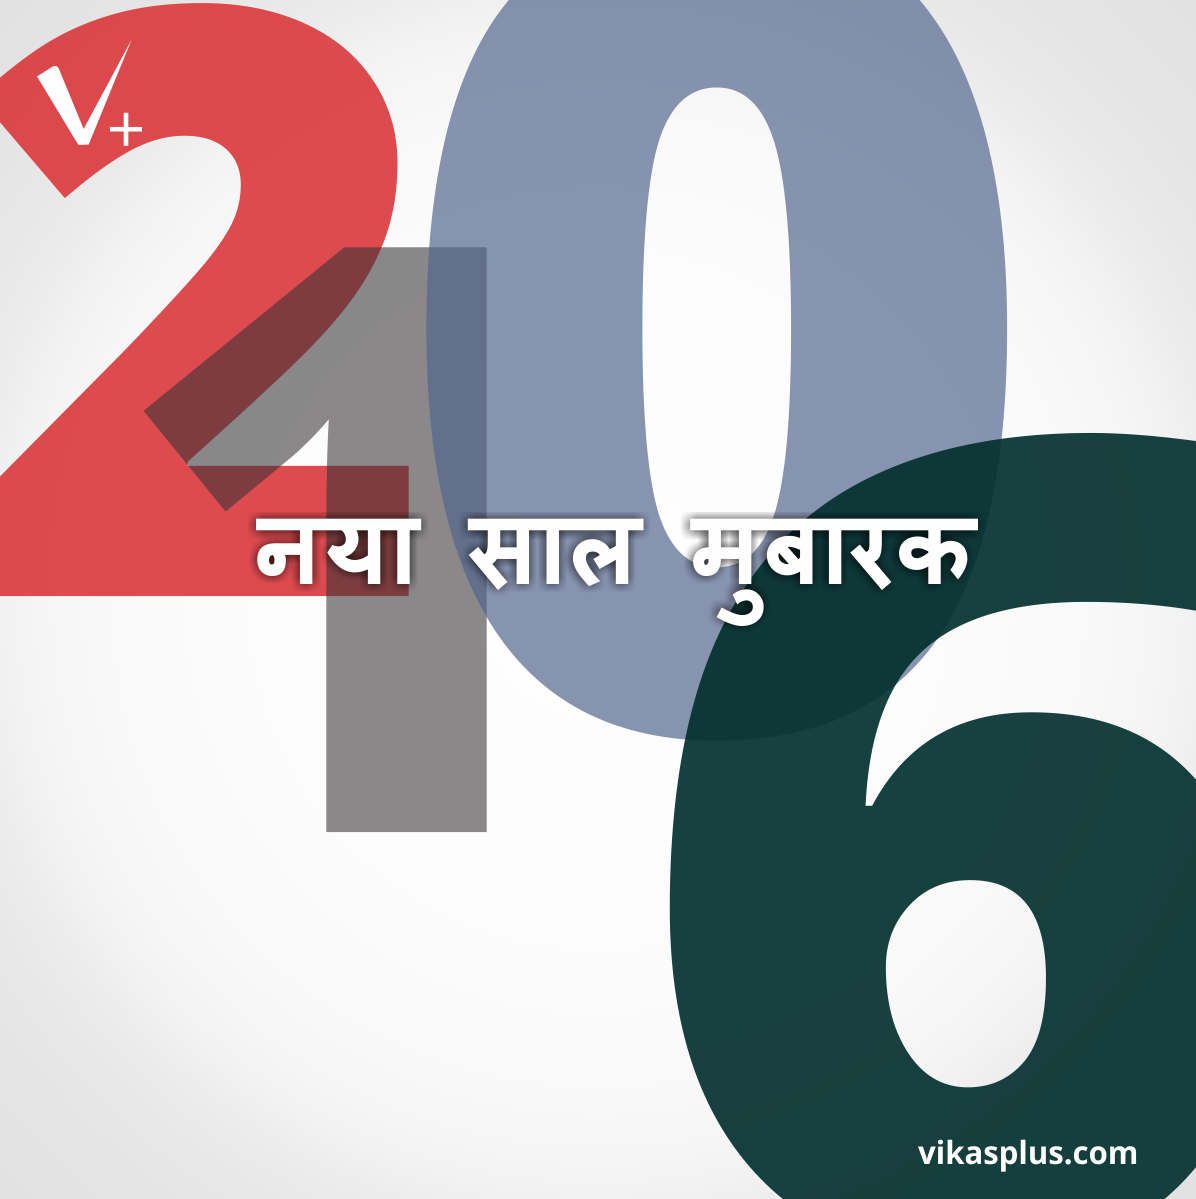 vikasplus-happy-new-year-1